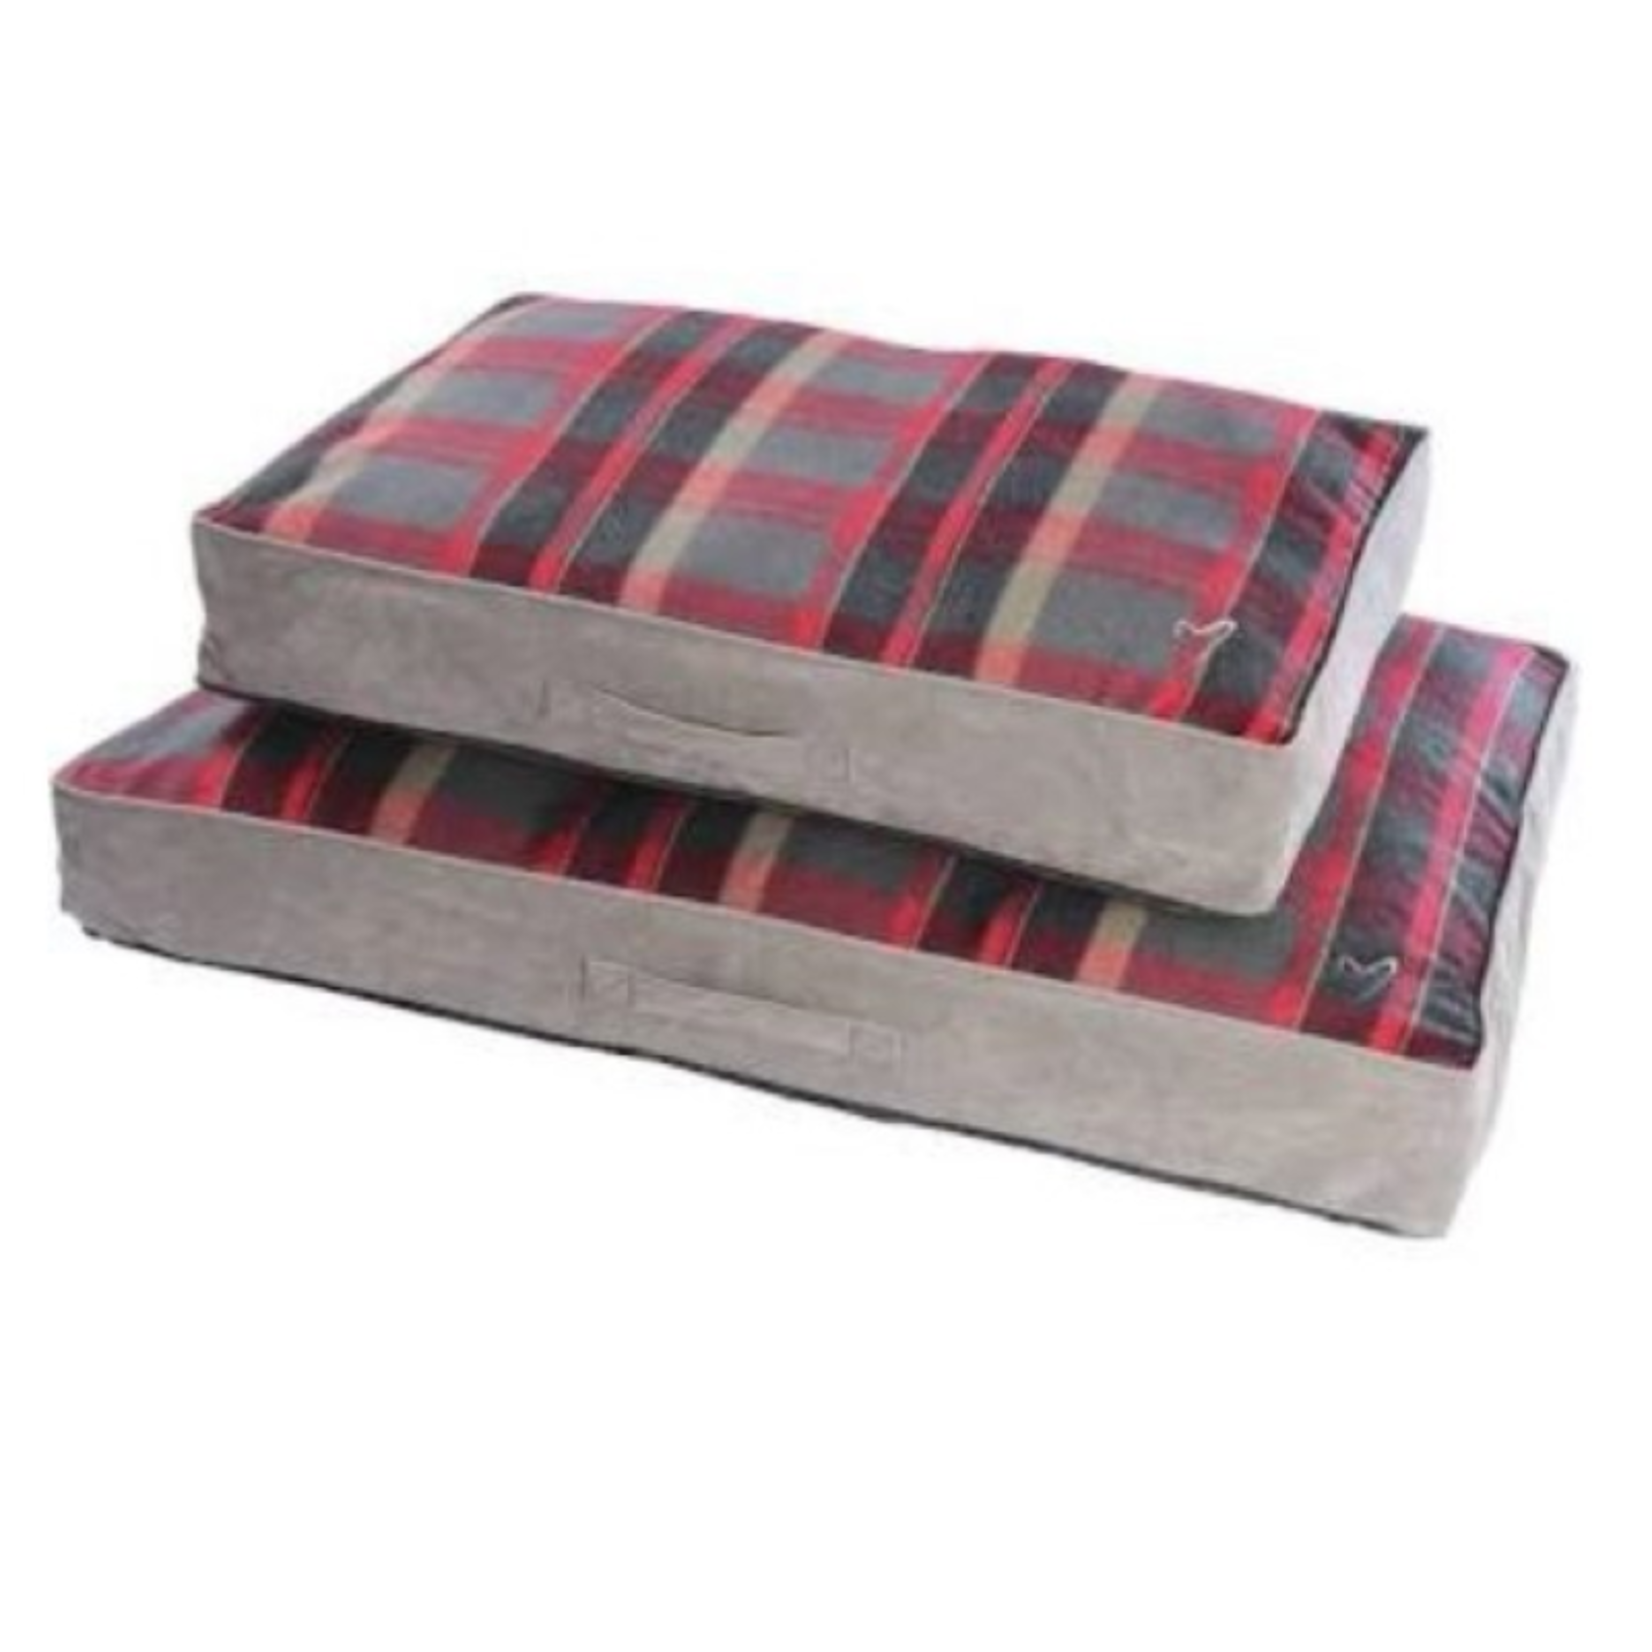 Gor Pets Camden Sleeper Deluxe Dog Bed, Large 71x107x13cm